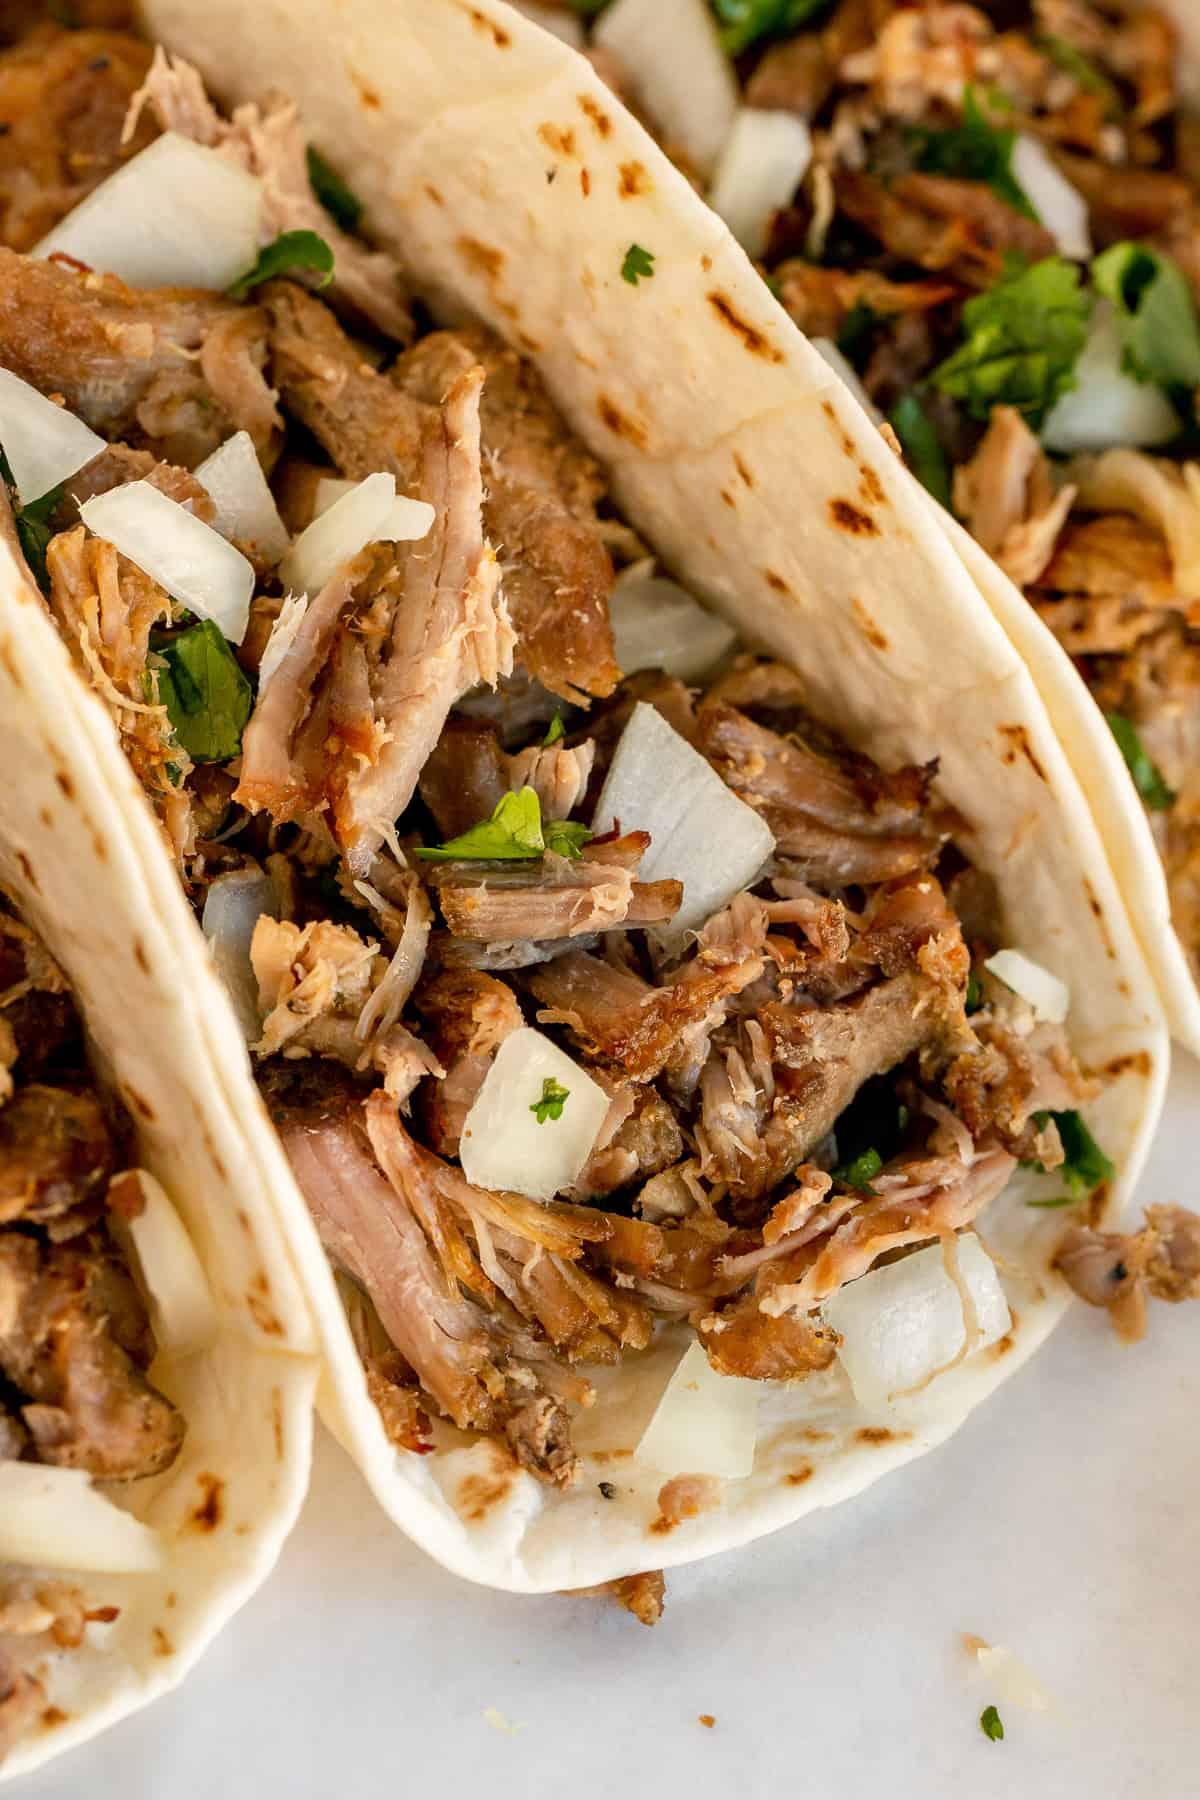 A closeup of a carnitas taco.